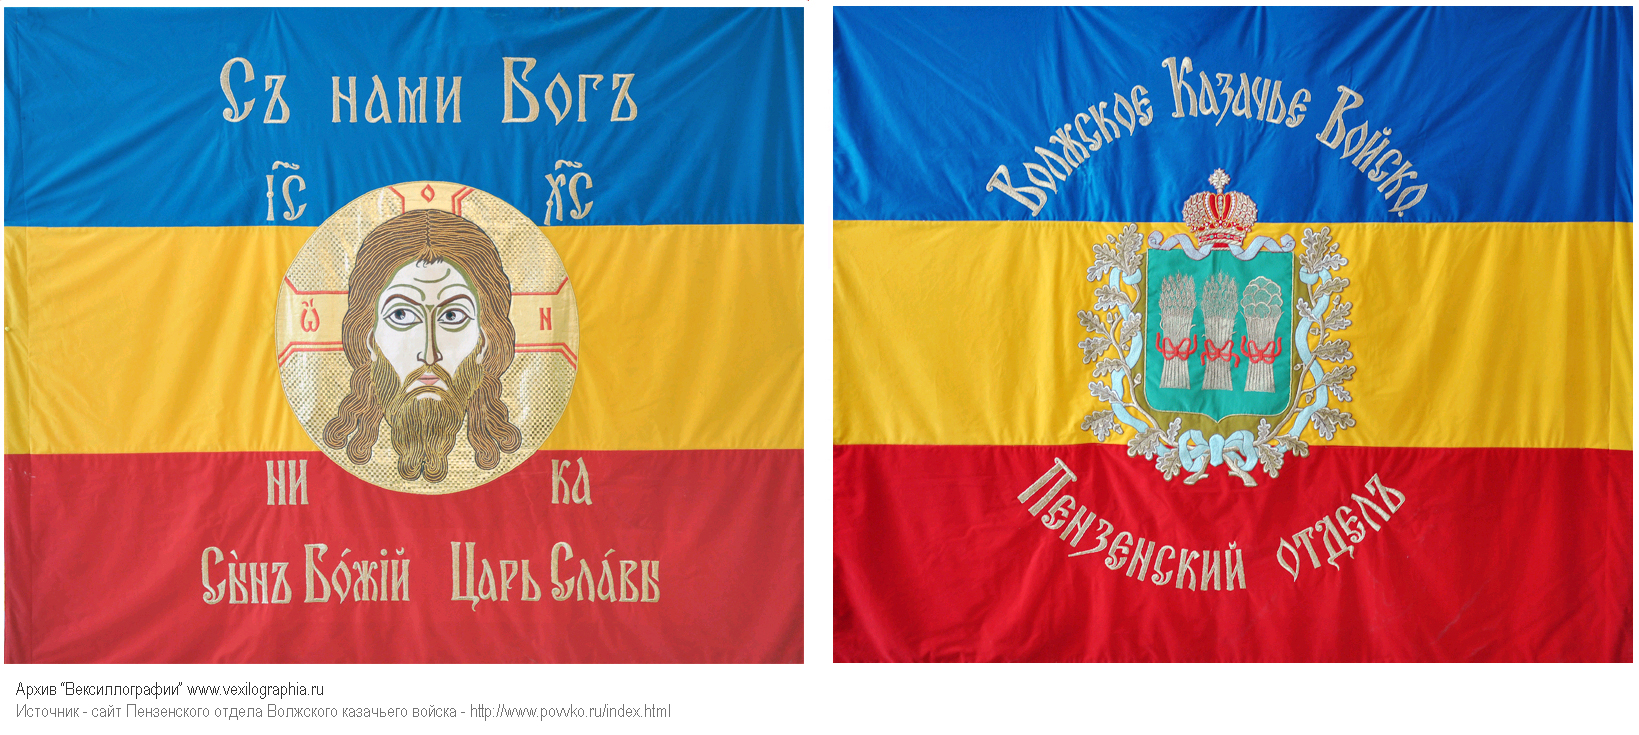 казачьи знамена в РФ: http://www.vexillographia.ru/russia/modcosak.htm